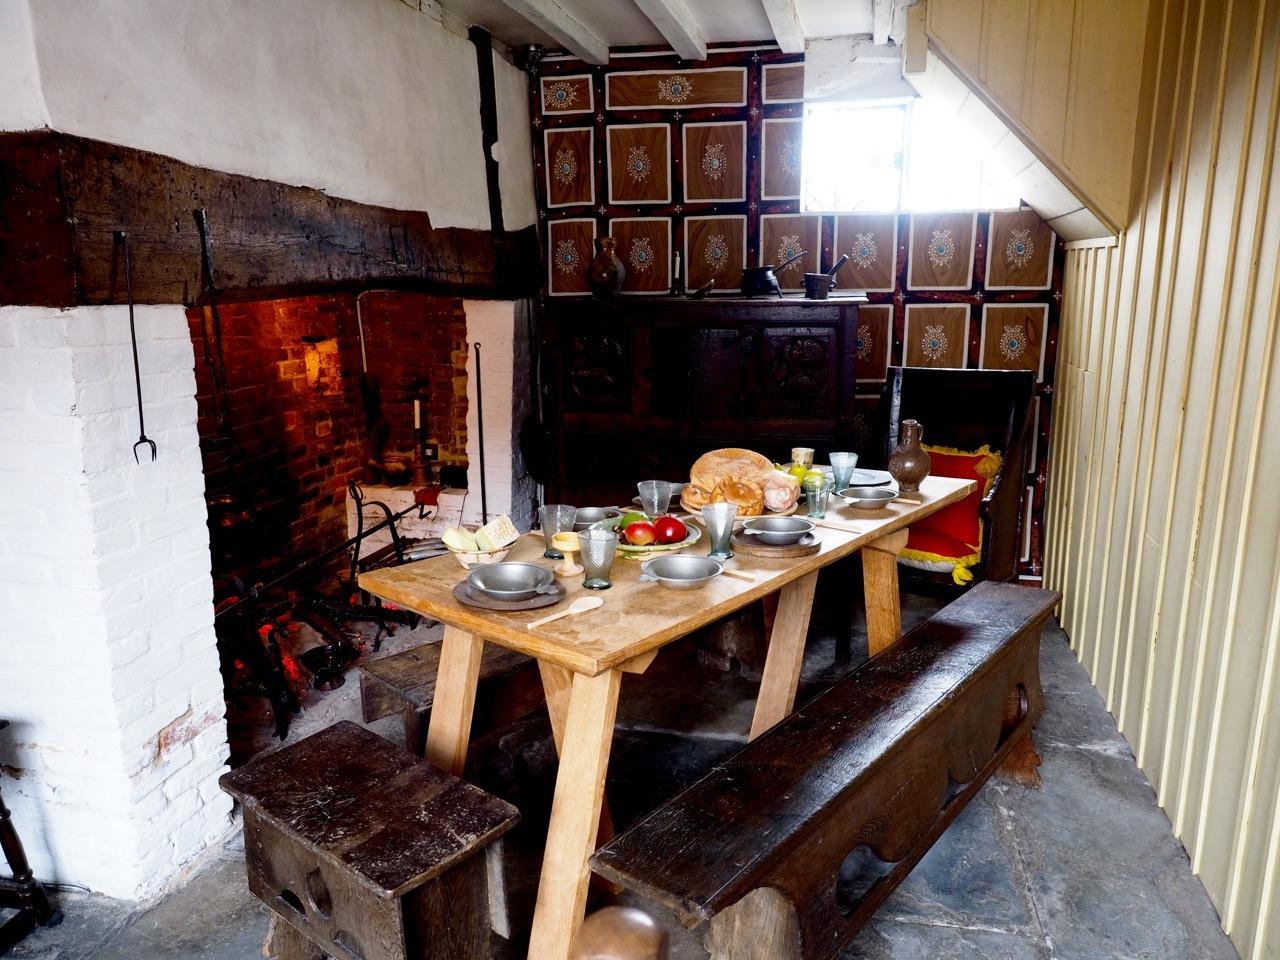 shakespeare birthplace stratford-upon-avon